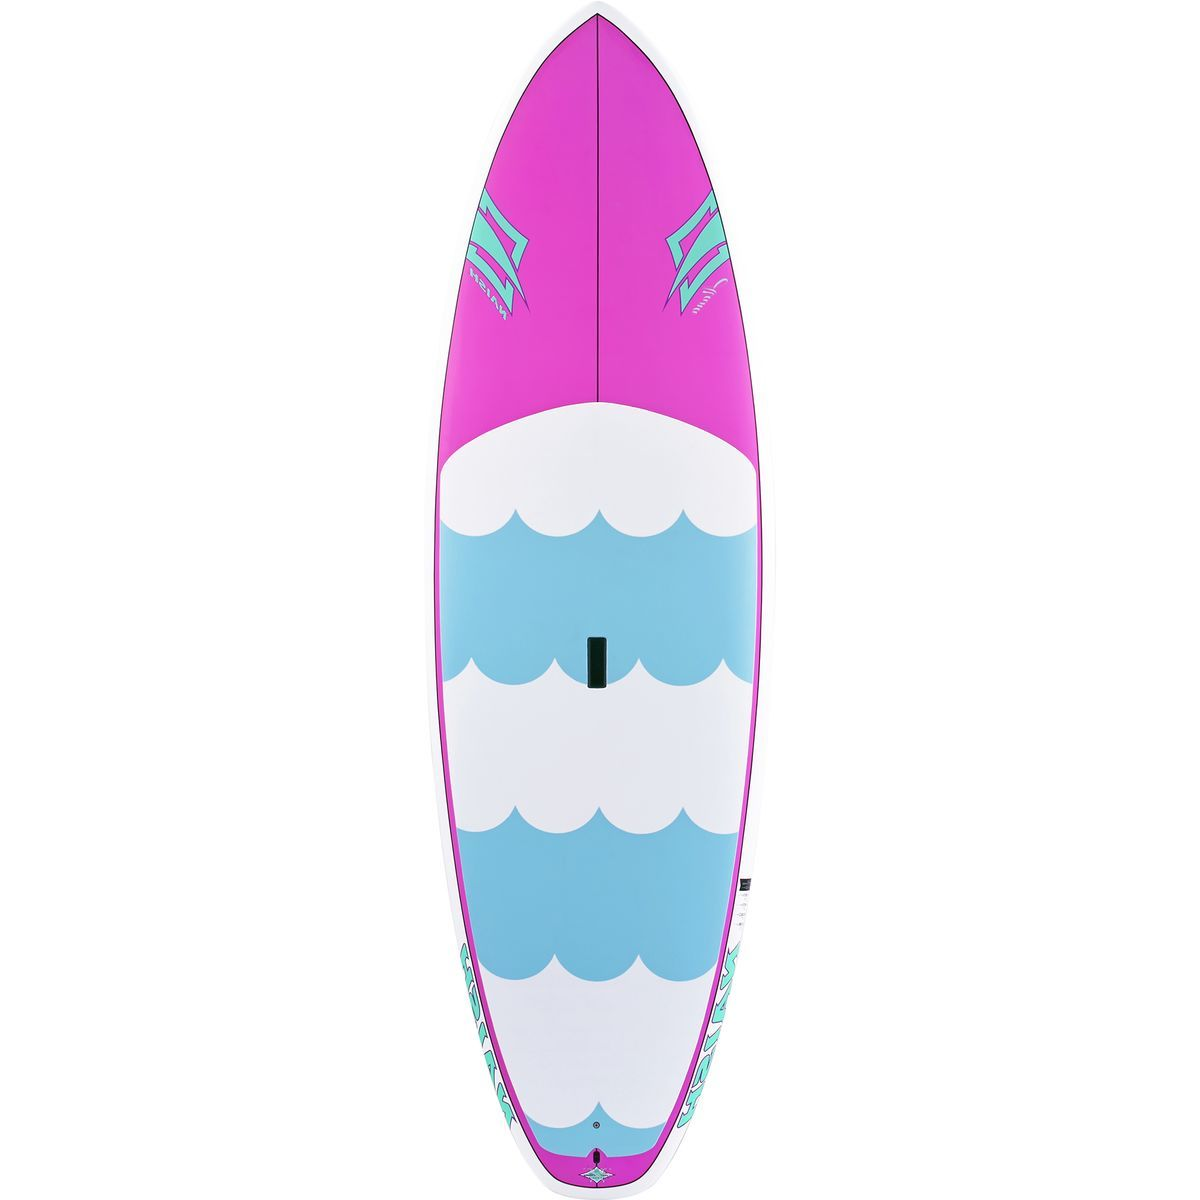 Naish Alana GS Series Stand-Up Paddleboard - Women's